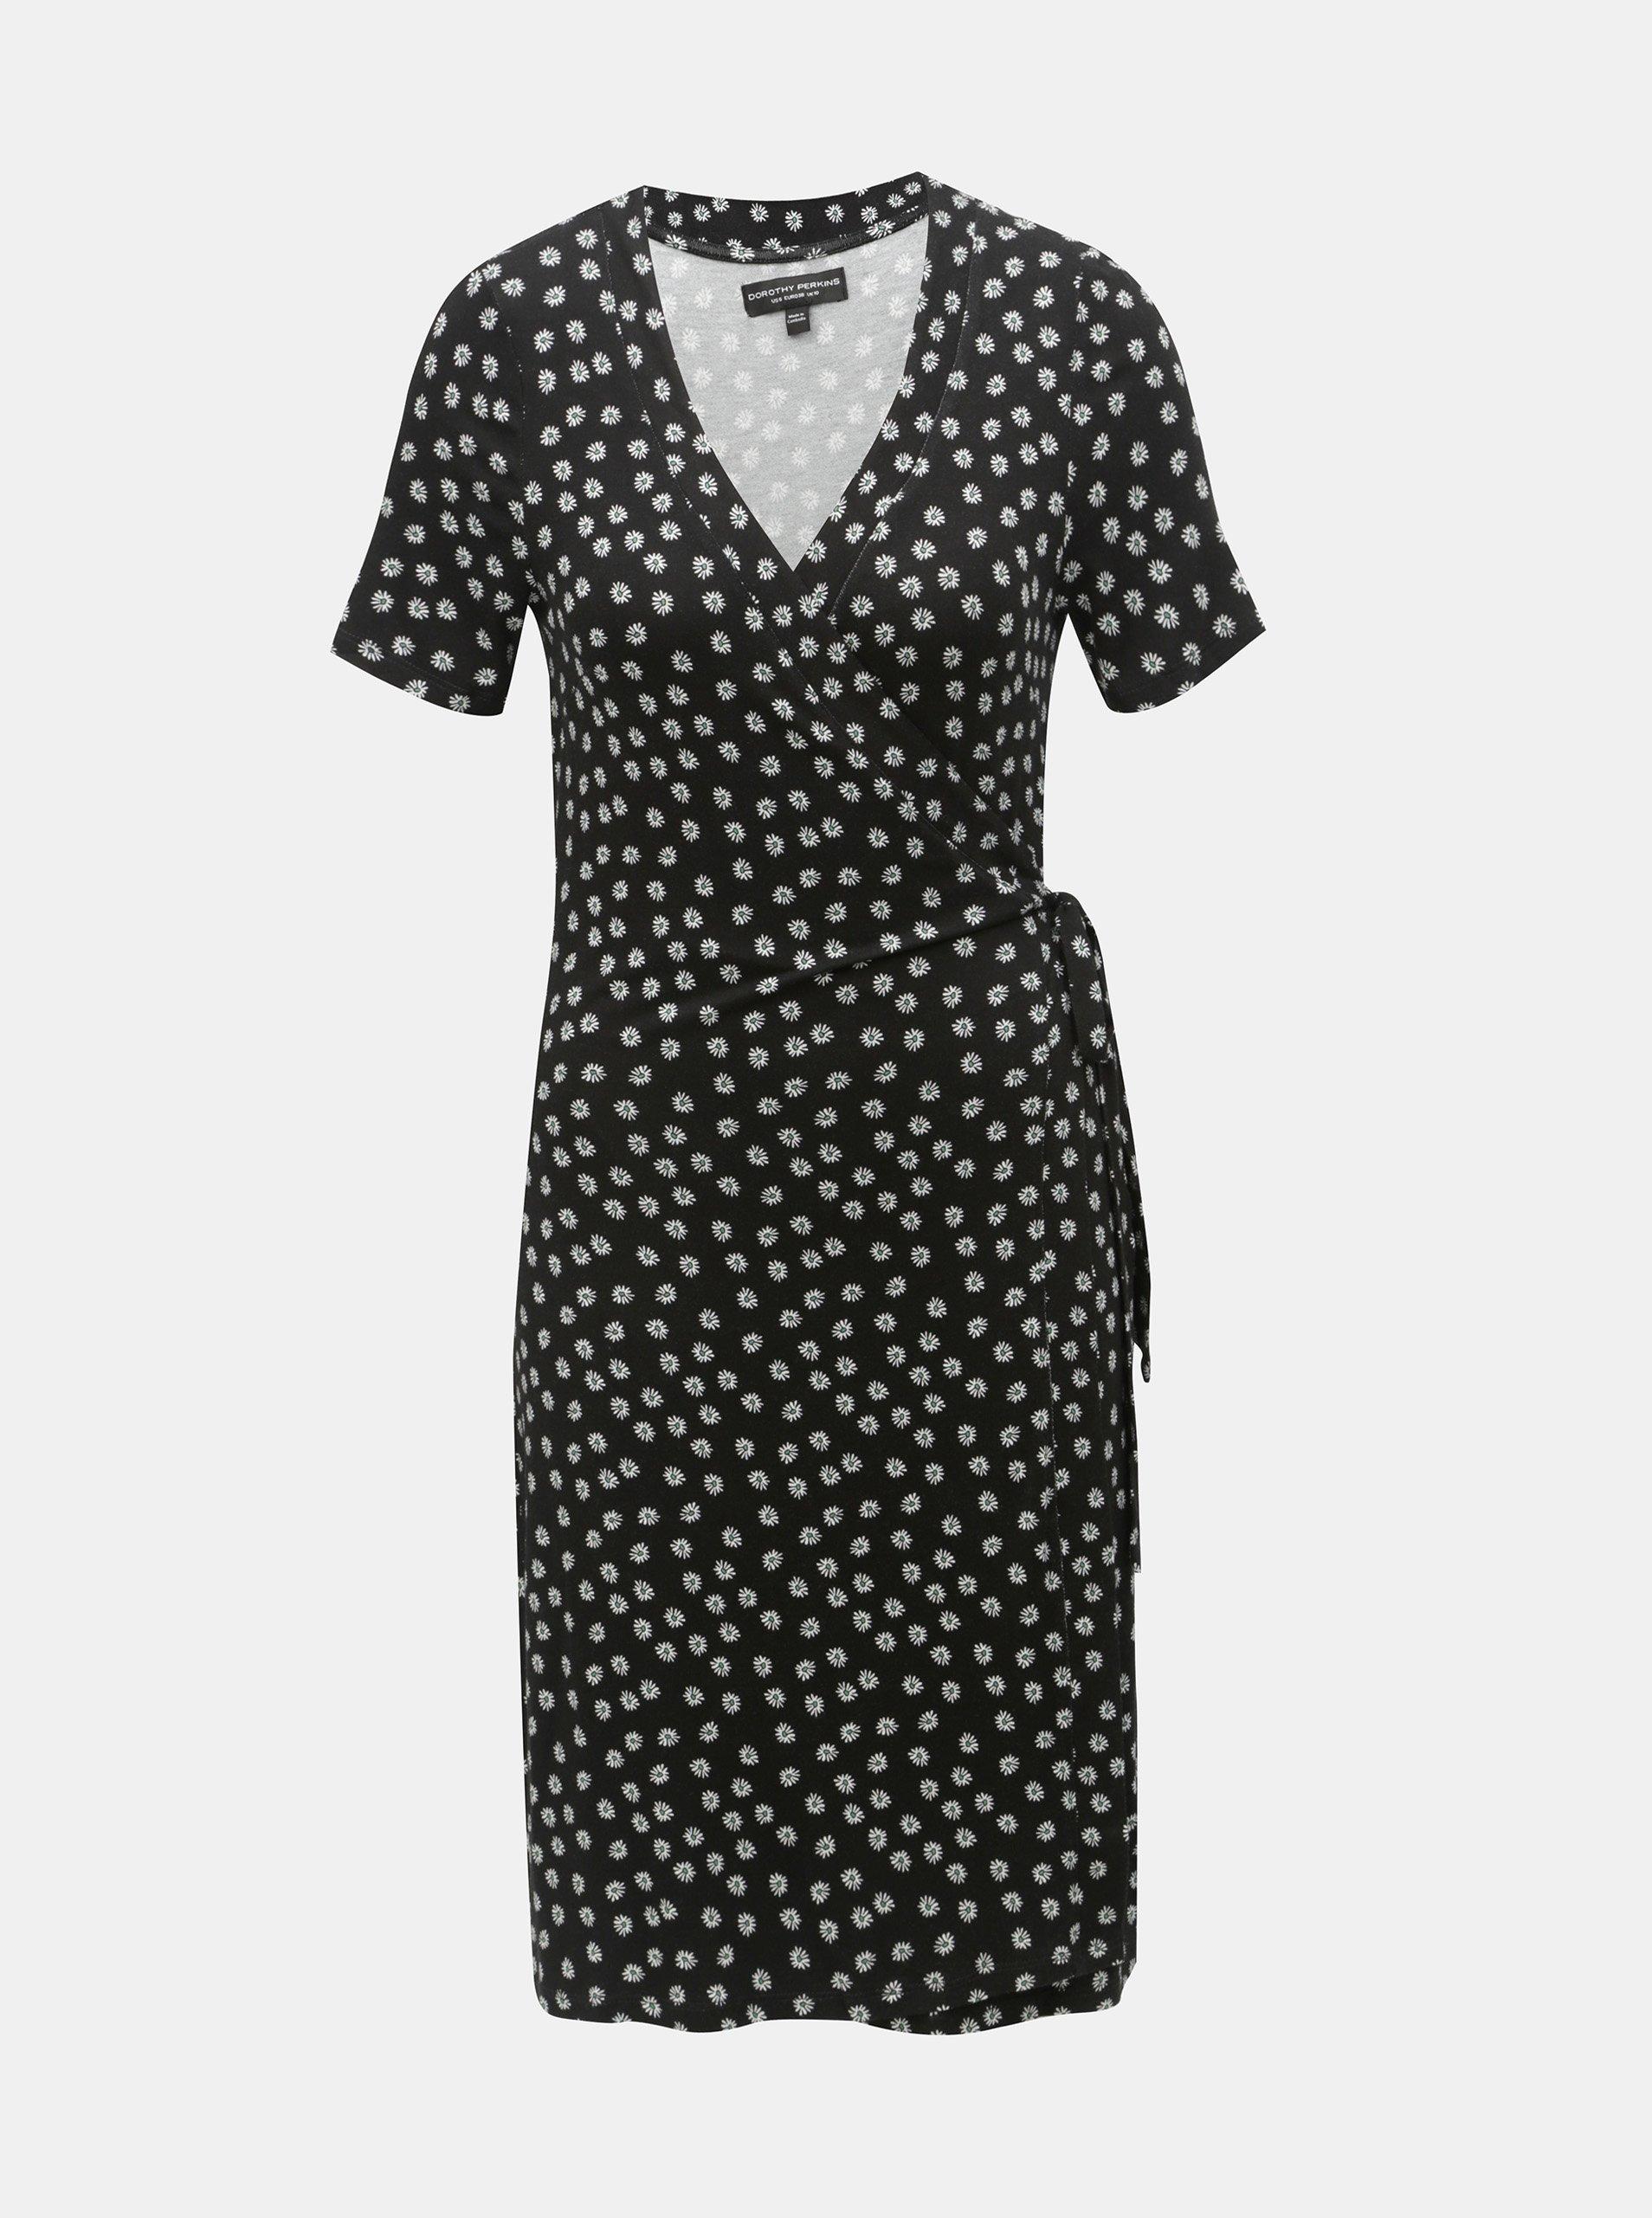 a62e7a4e3264 Černé květované zavinovací šaty Dorothy Perkins